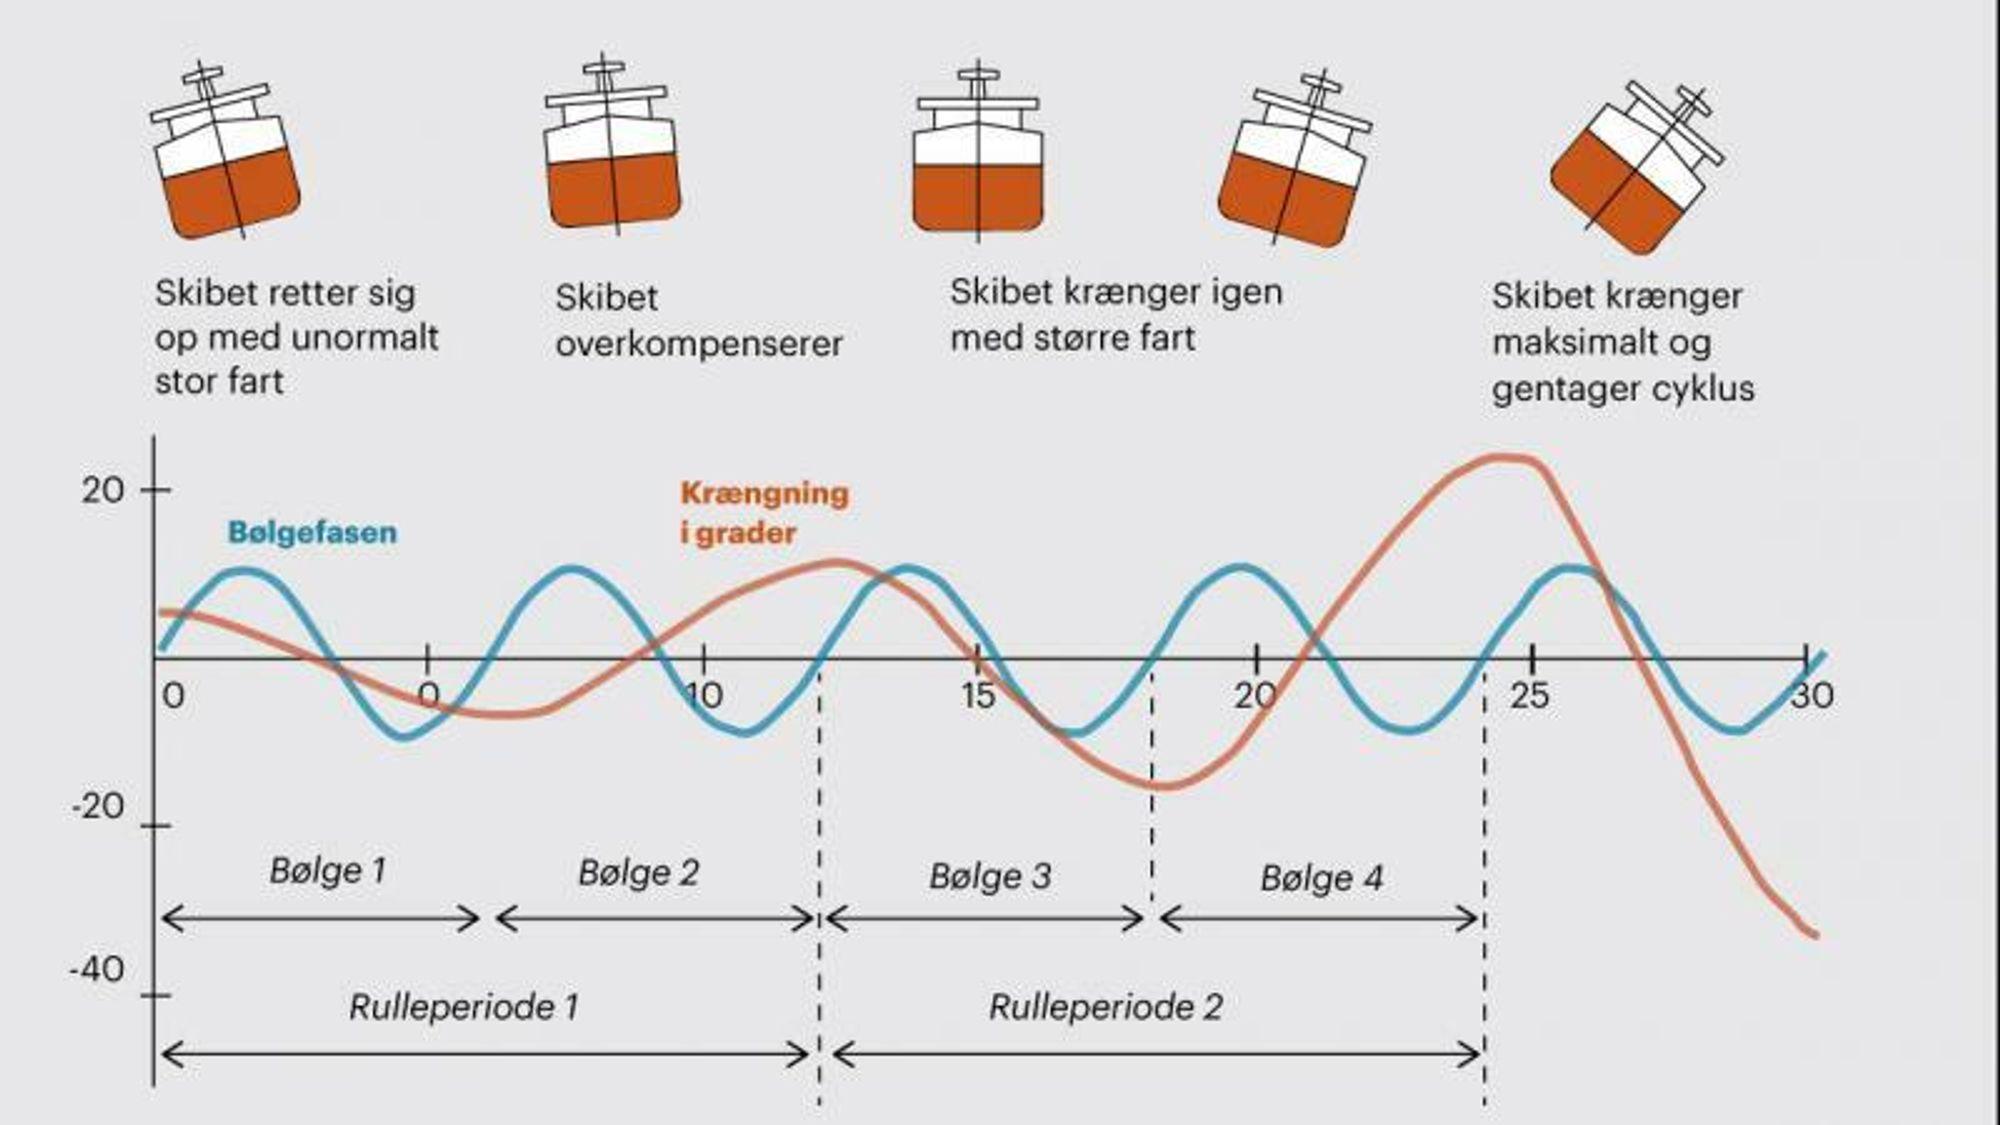 Video: Uvanlig fenomen i gigantiske skip skaper problemer